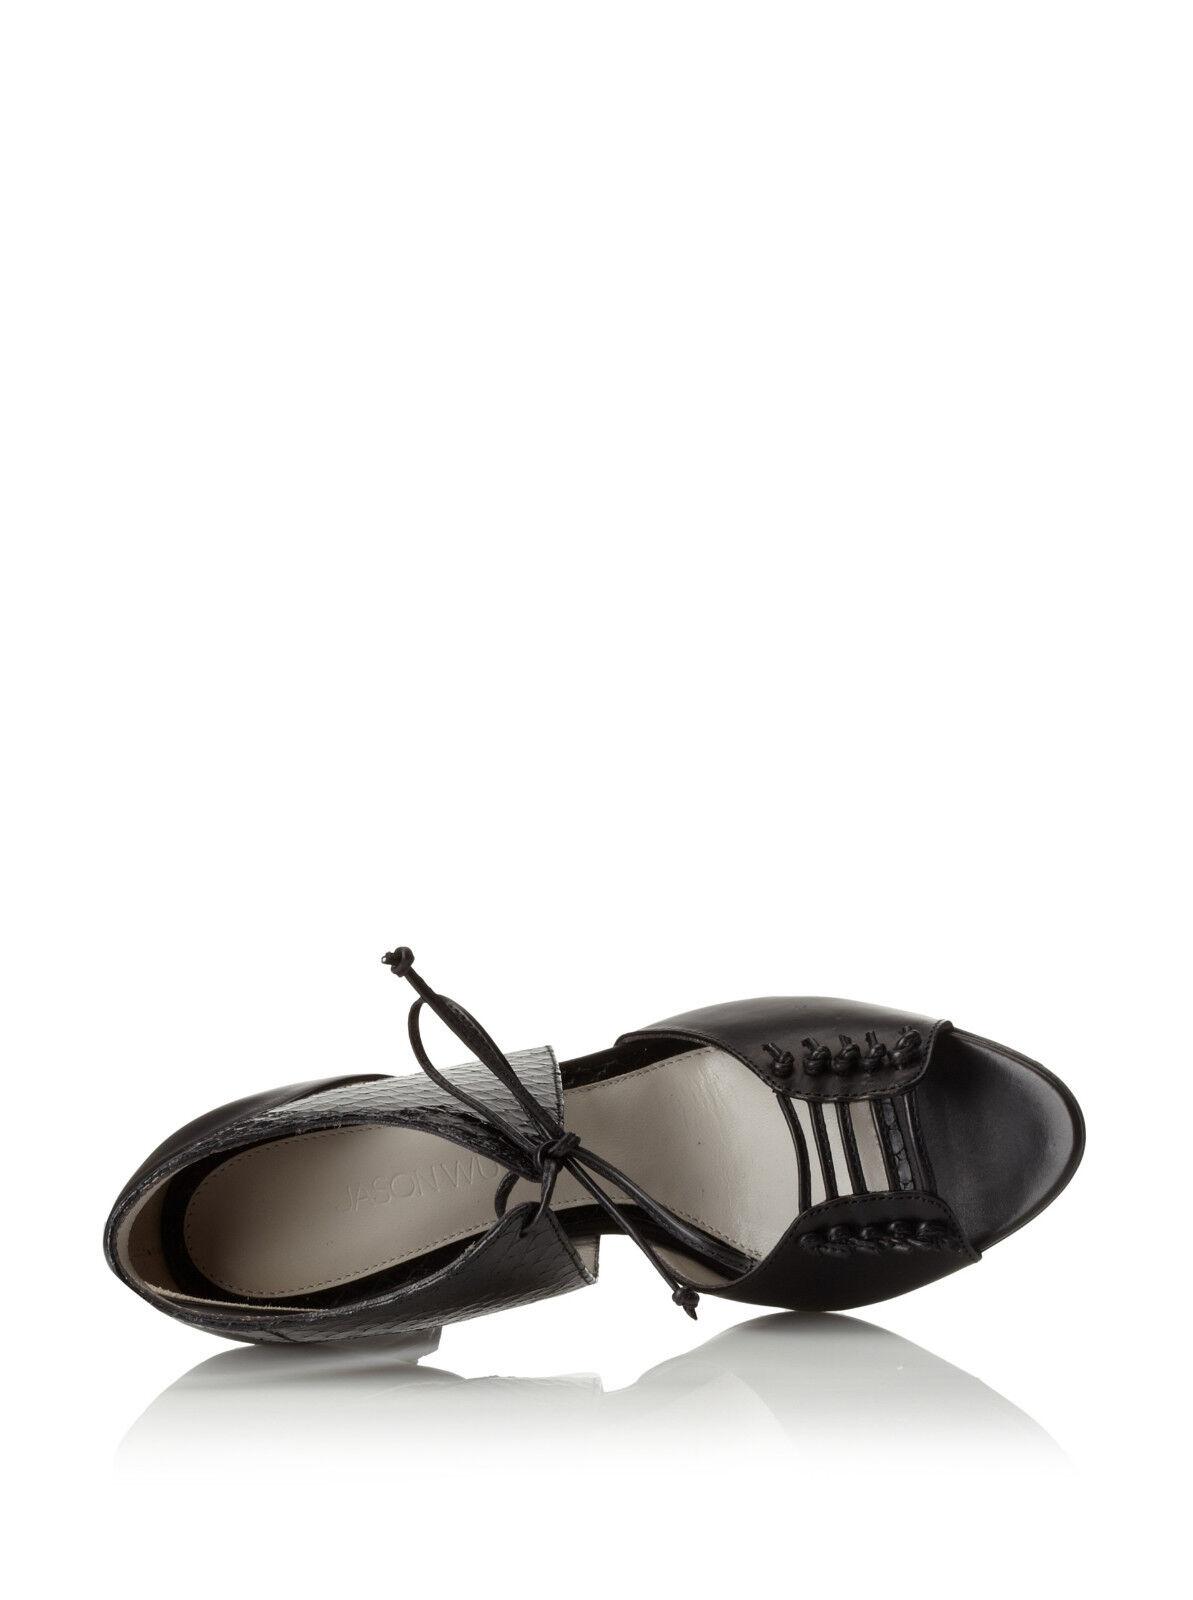 795 795 795 Jason Wu Billie nero leather ankle tie sandals scarpe heels 38 7.5 ITALY 4946df